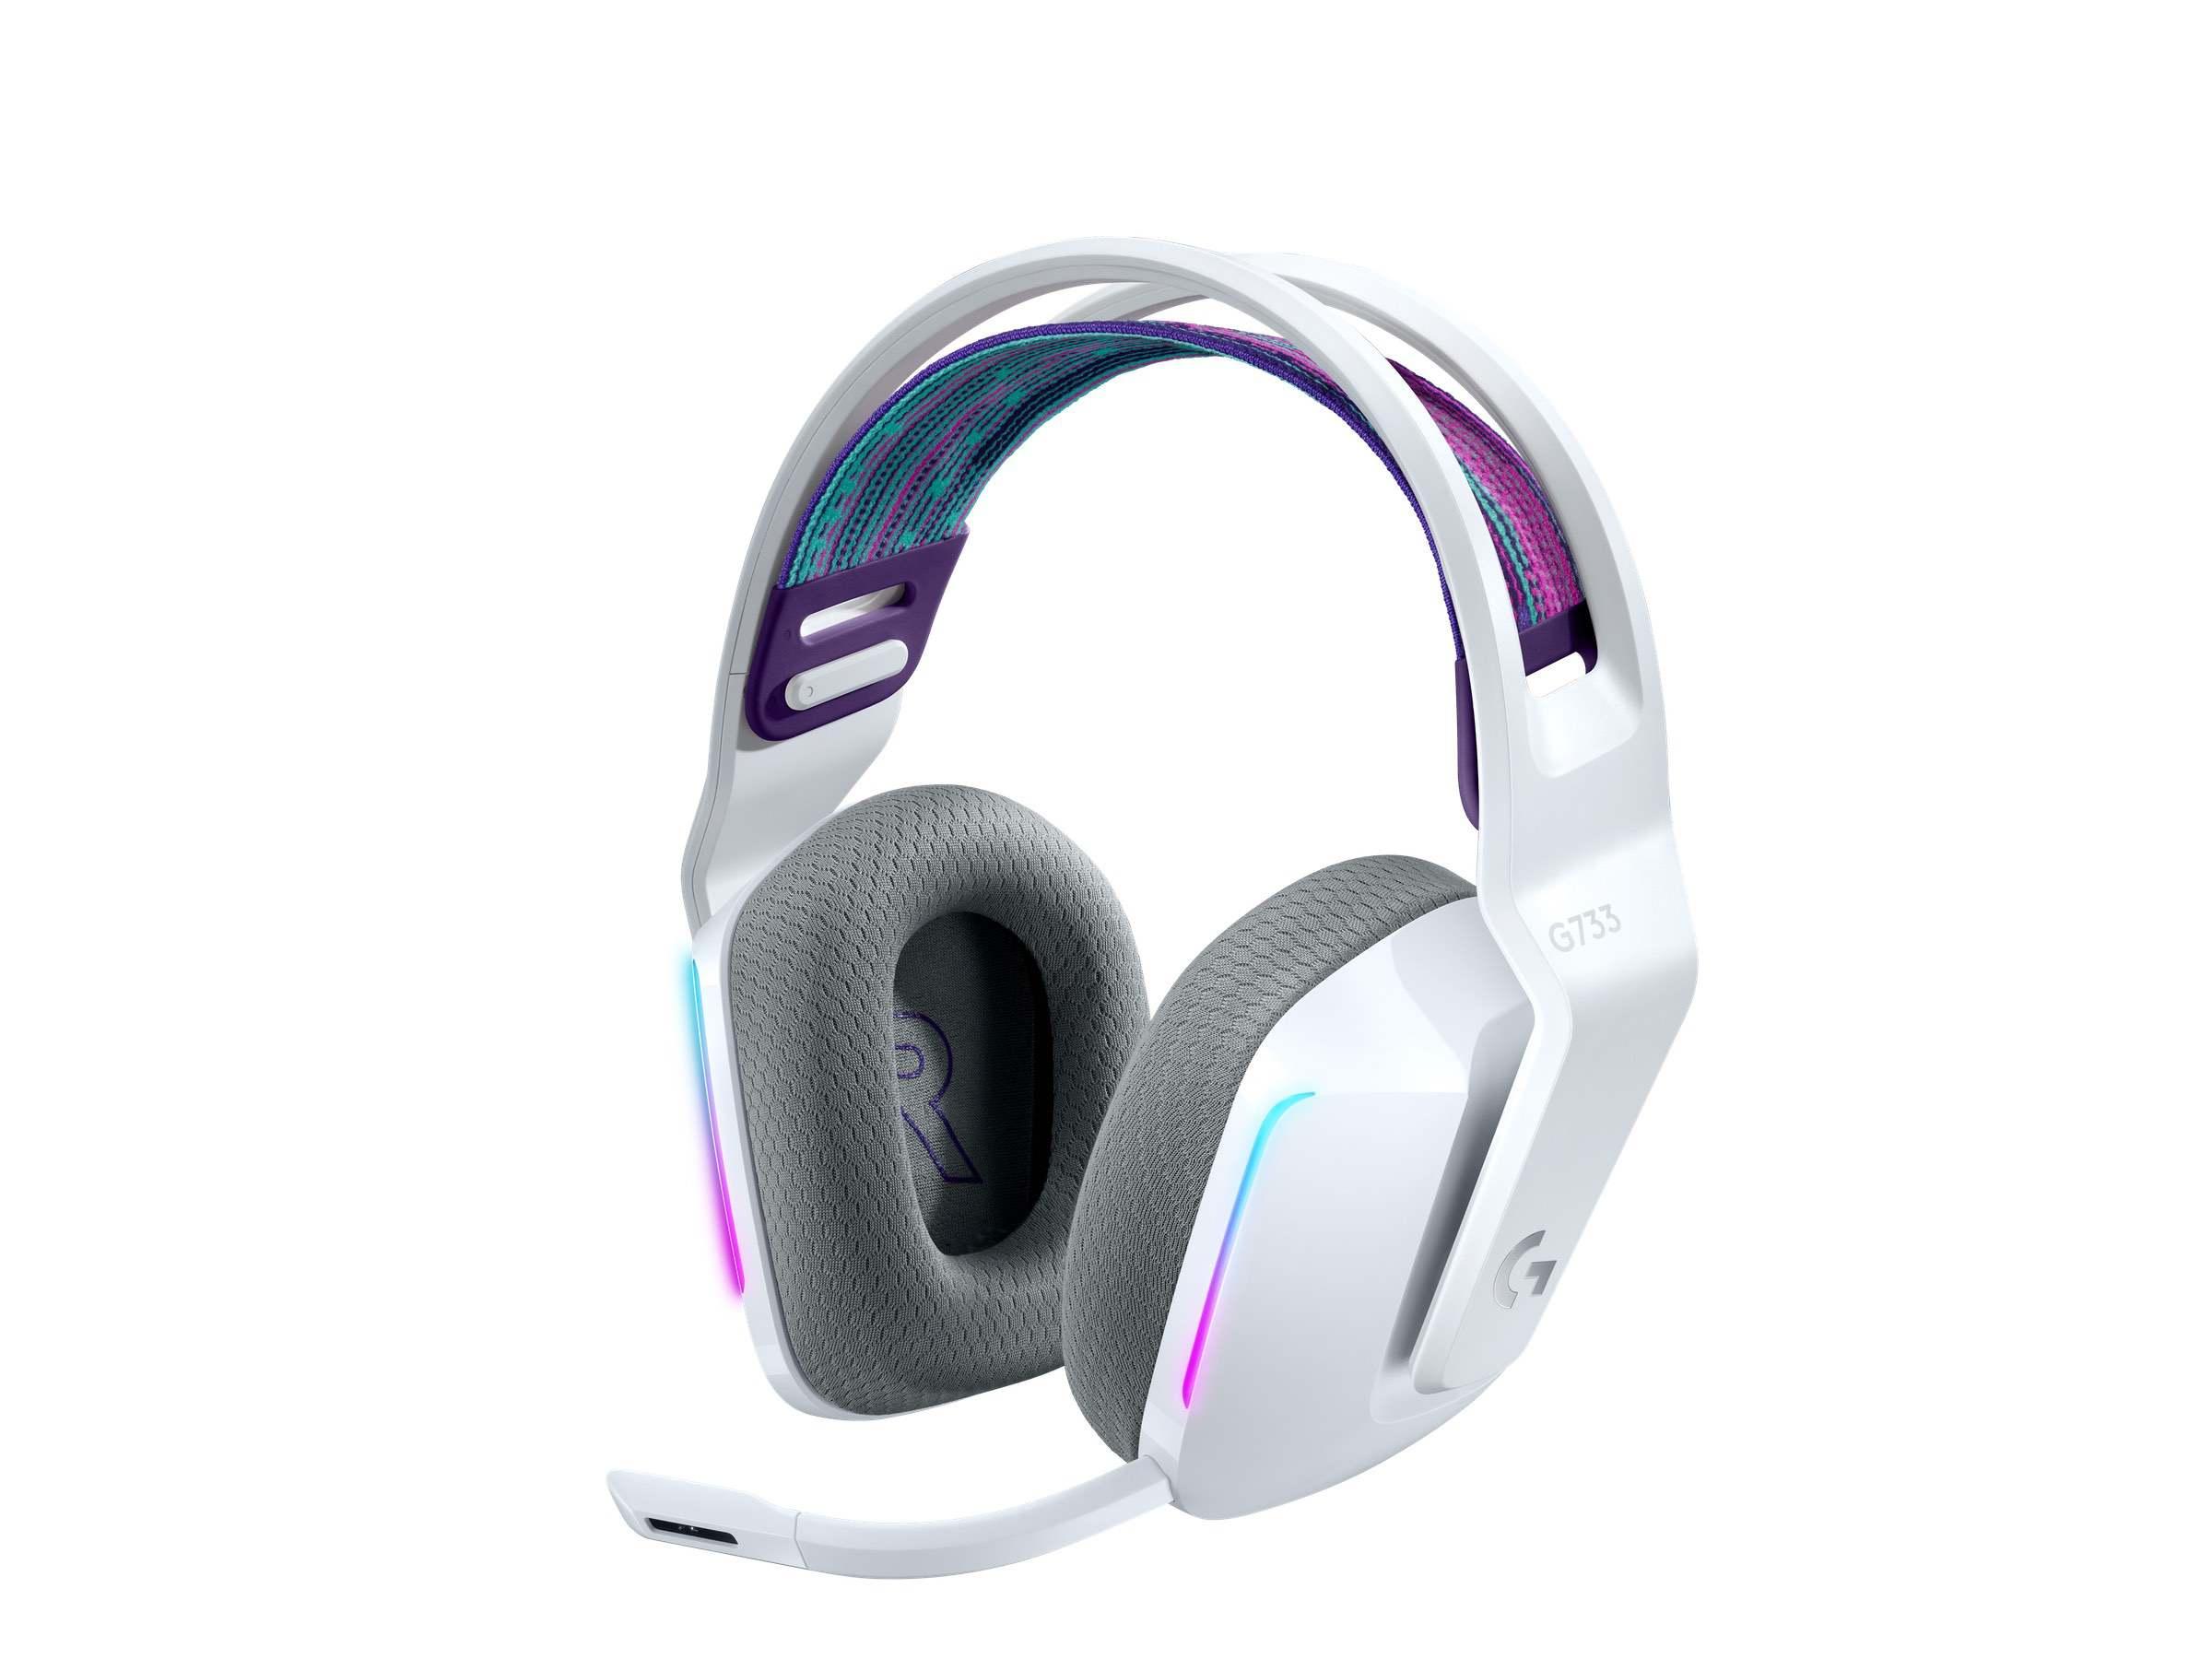 Logitech G – G733 LIGHTSPEED Gaming-Headset Ankündigung